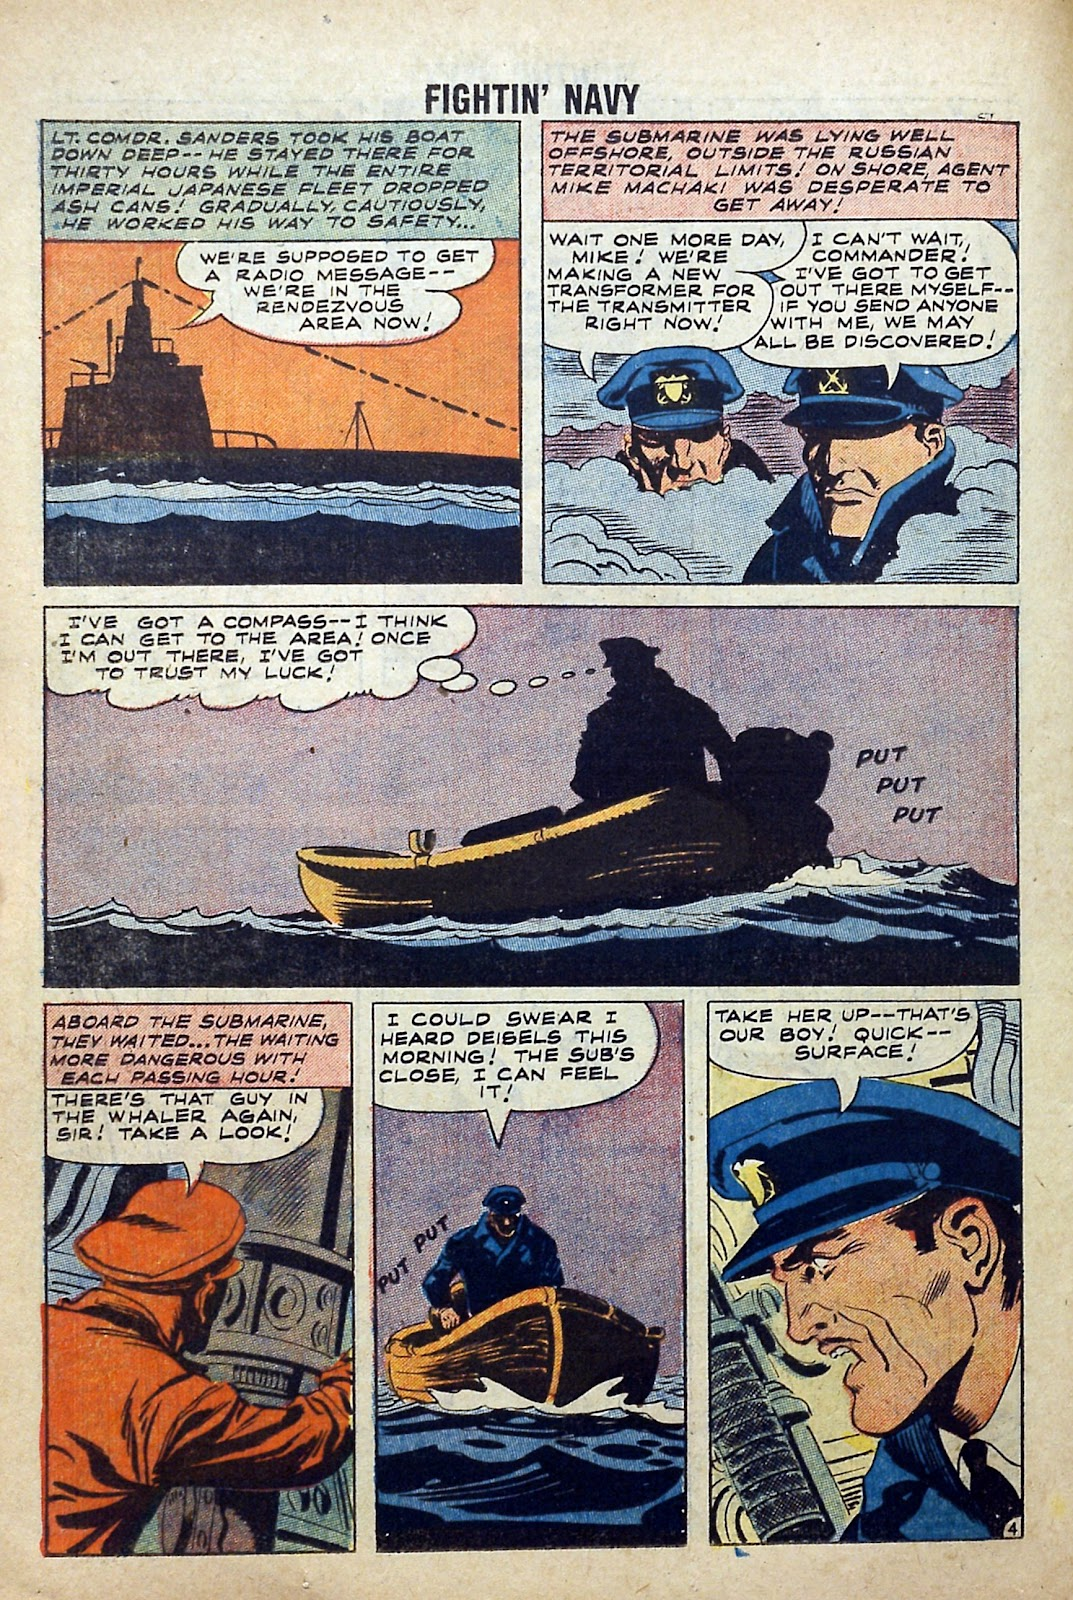 Read online Fightin' Navy comic -  Issue #84 - 26